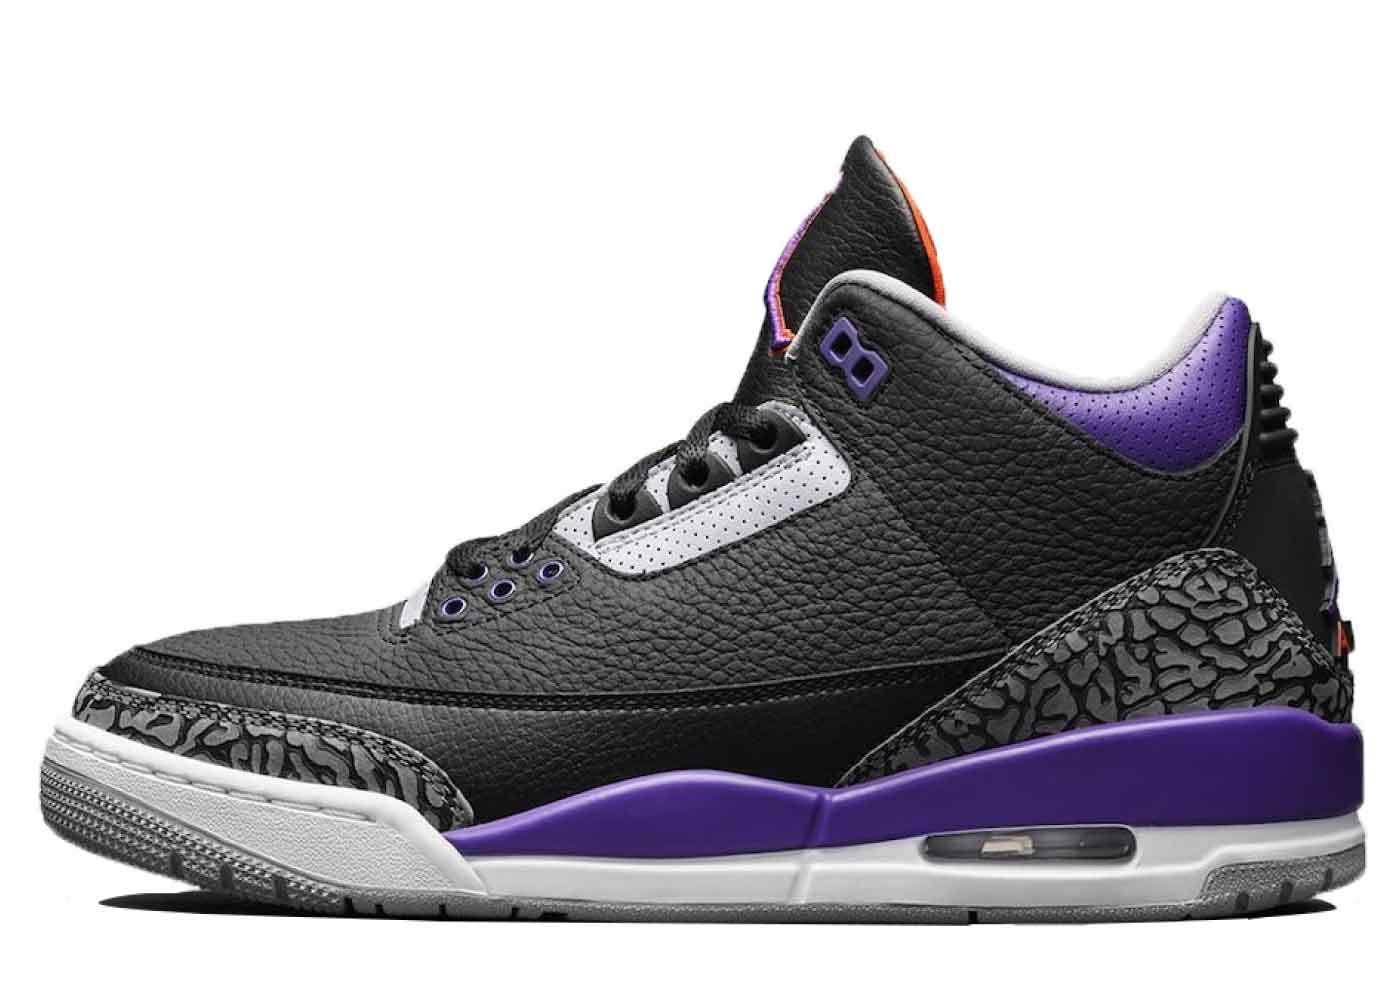 Nike Air Jordan 3 Retro Court Purpleの写真